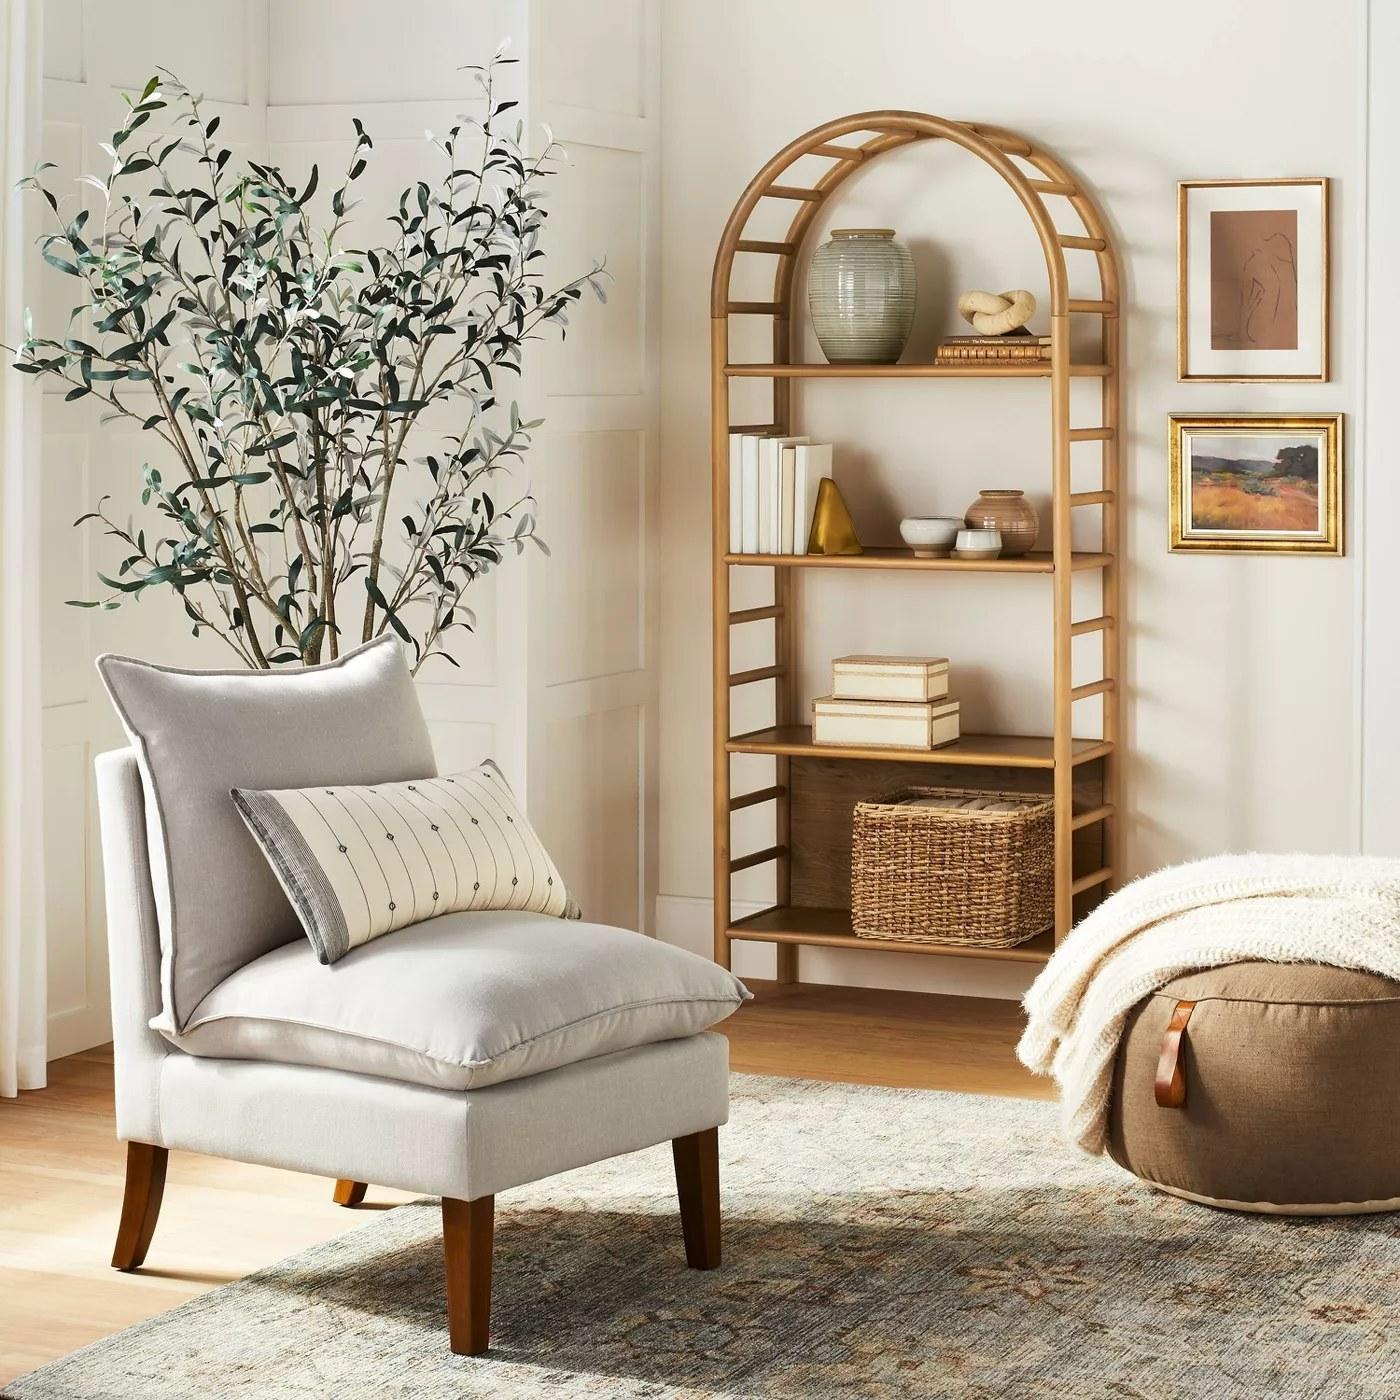 The bookshelf in a living room